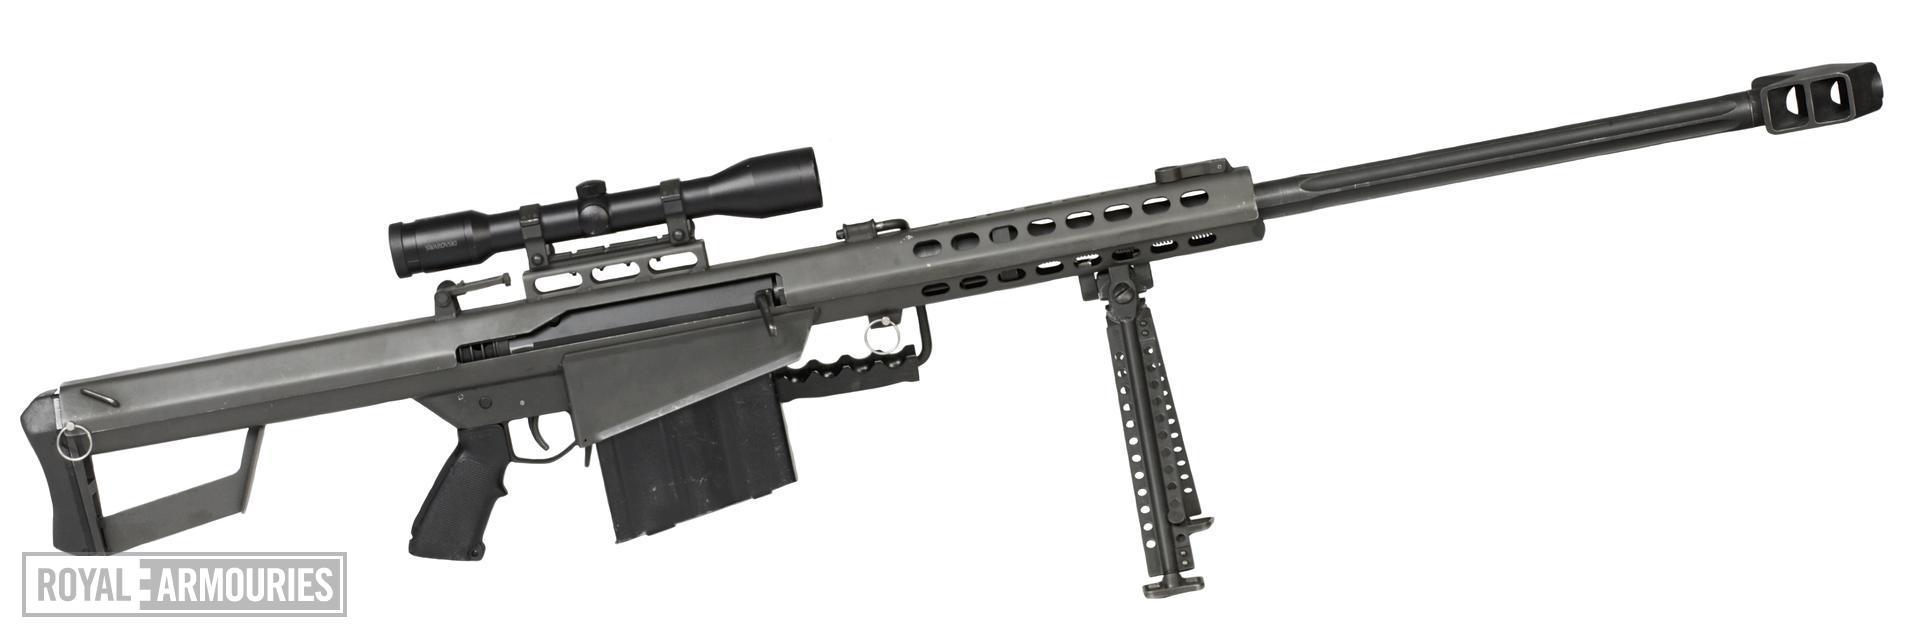 Centrefire self-loading rifle - Barrett M82A1